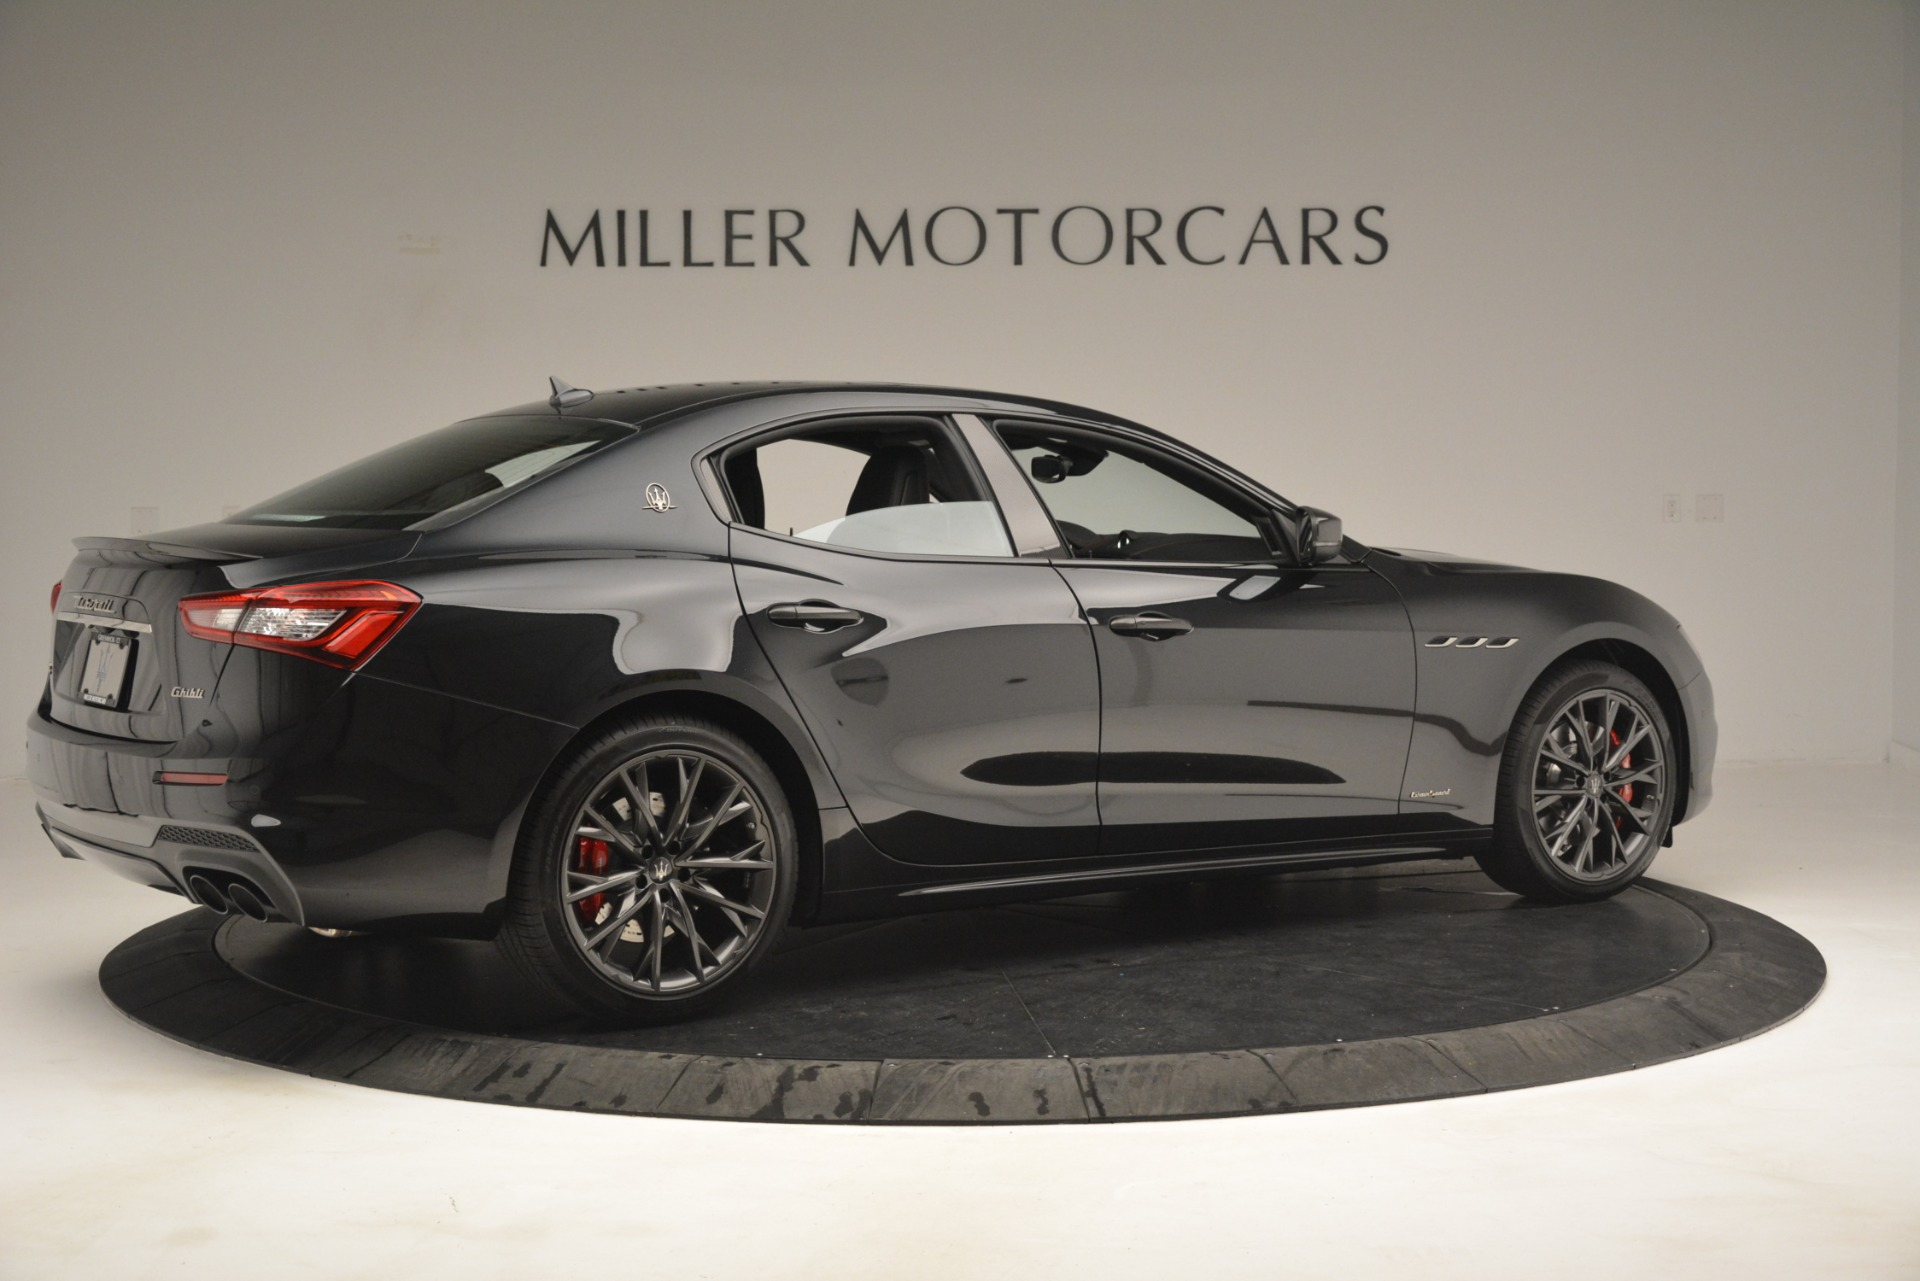 New 2019 Maserati Ghibli S Q4 GranSport For Sale In Greenwich, CT. Alfa Romeo of Greenwich, W667 2924_p8